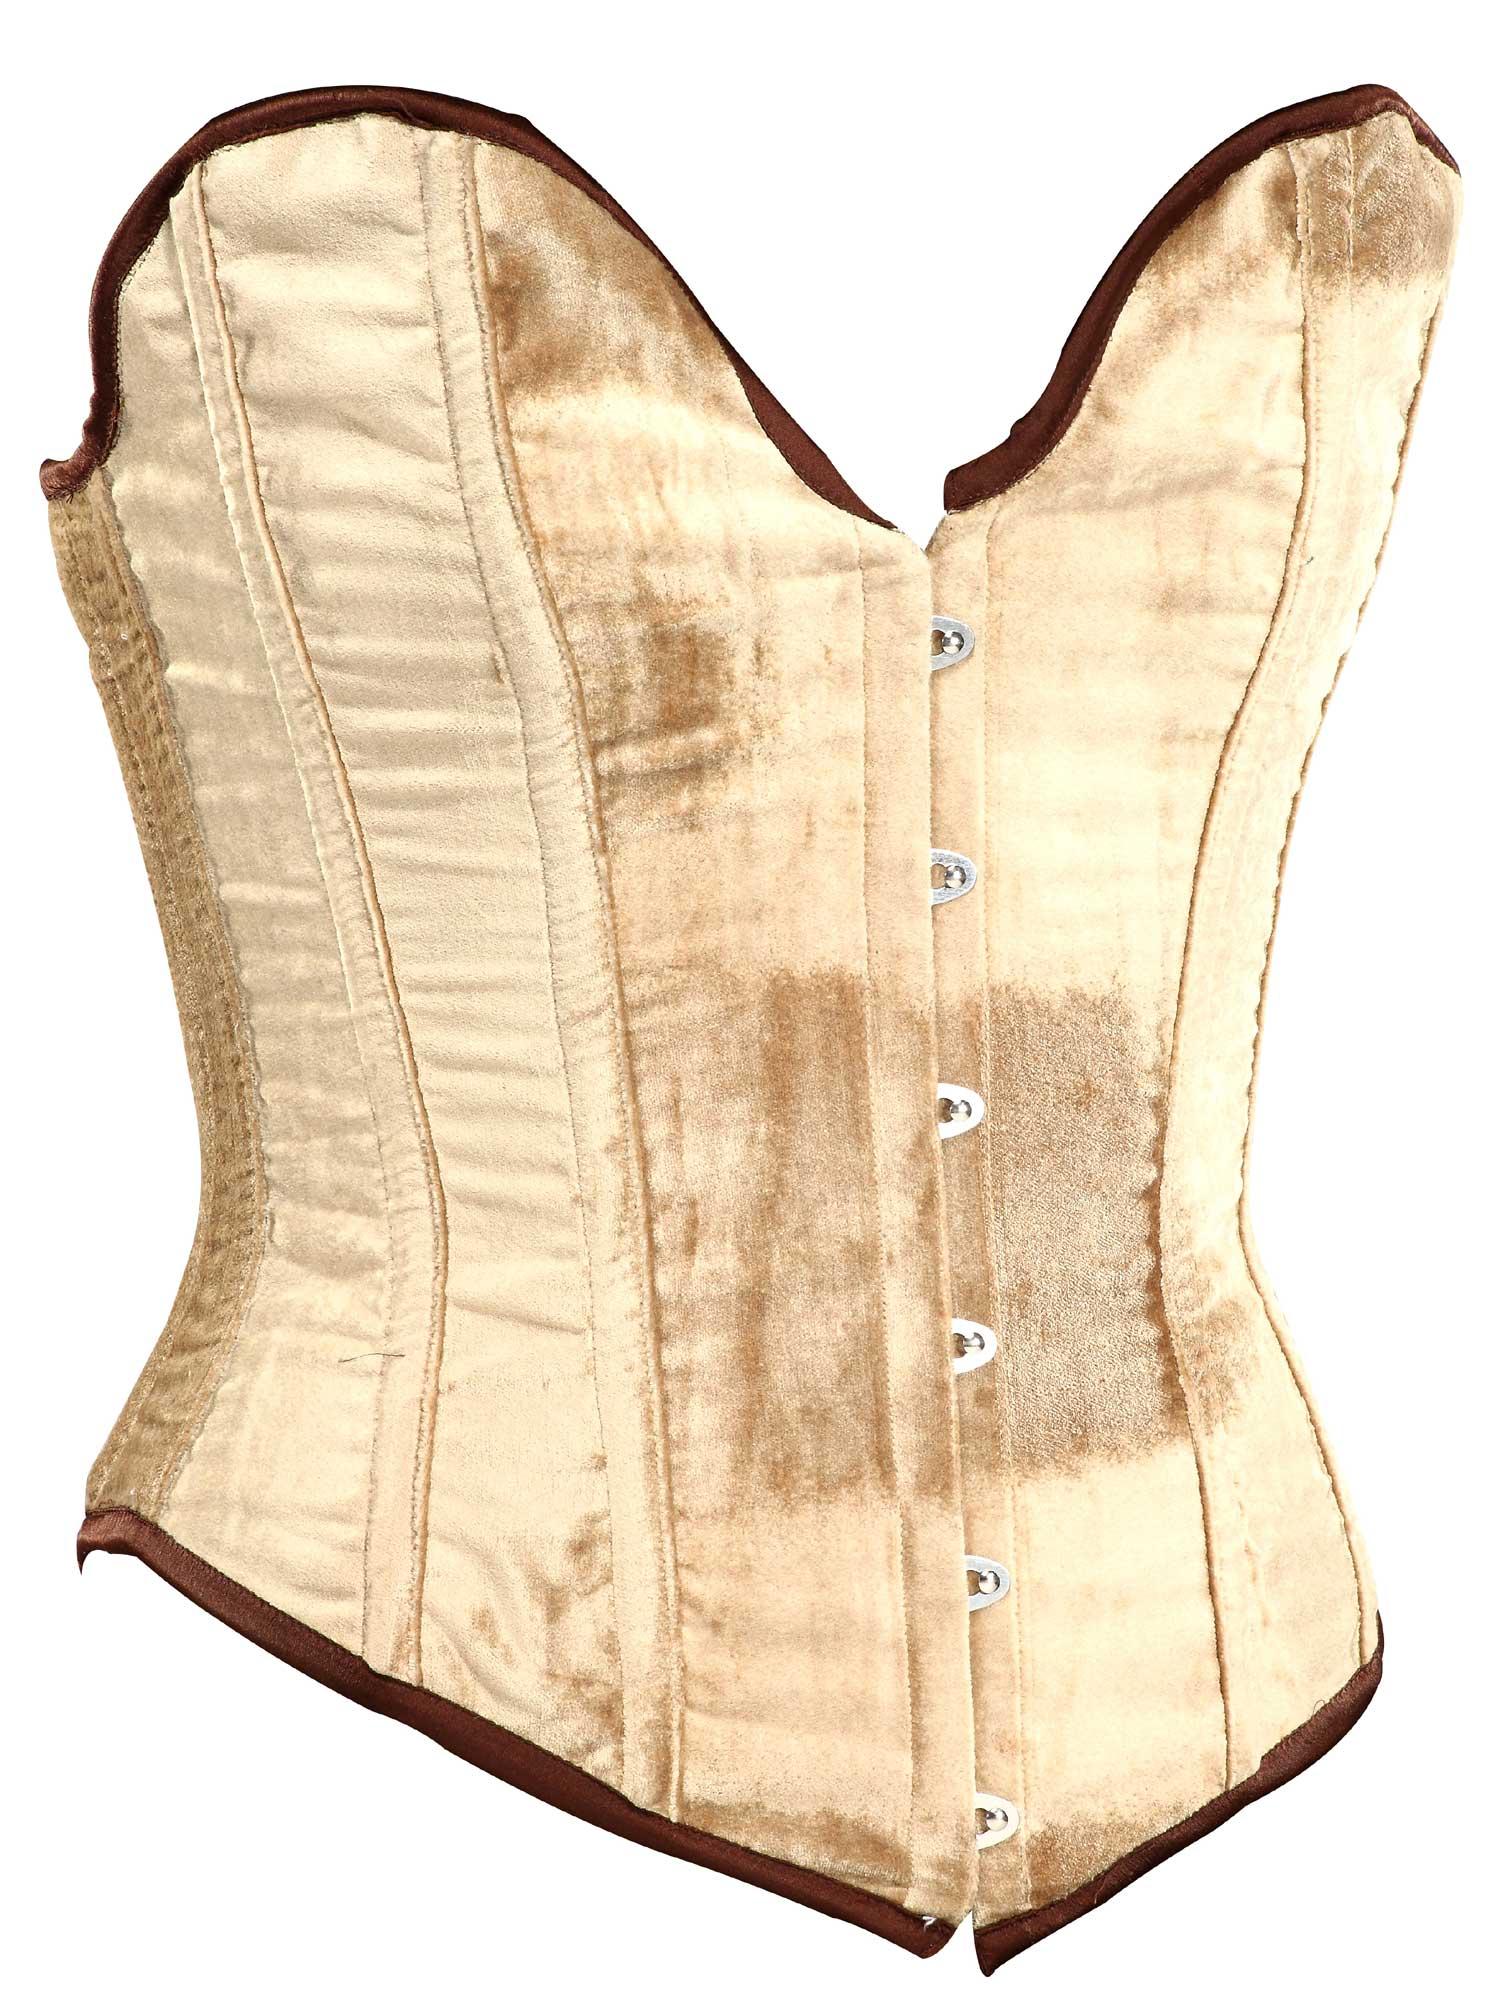 beige_velvet_fabric_steel_boning_overbust_corset_waist_cincher_bustier_bustiers_and_corsets_4.jpg